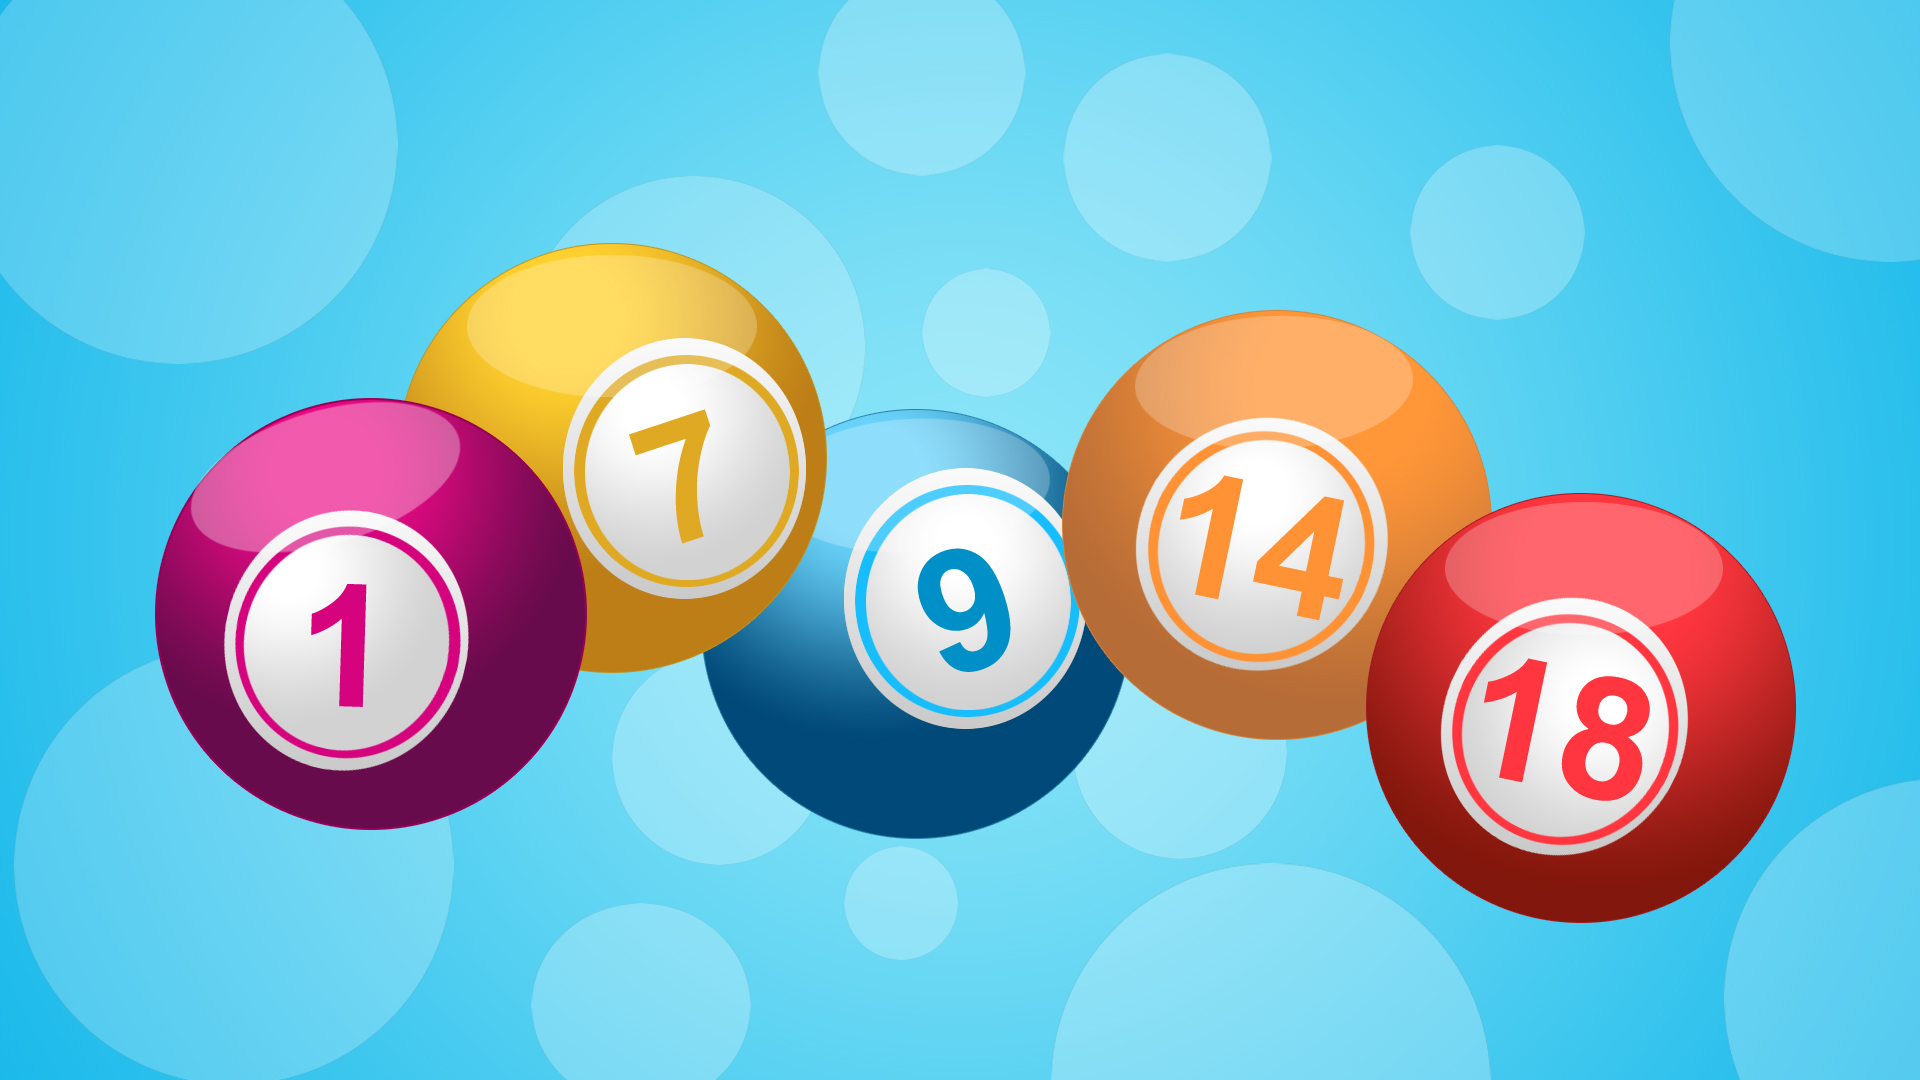 Free Bingo Balls, Download Free Clip Art, Free Clip Art on Clipart.